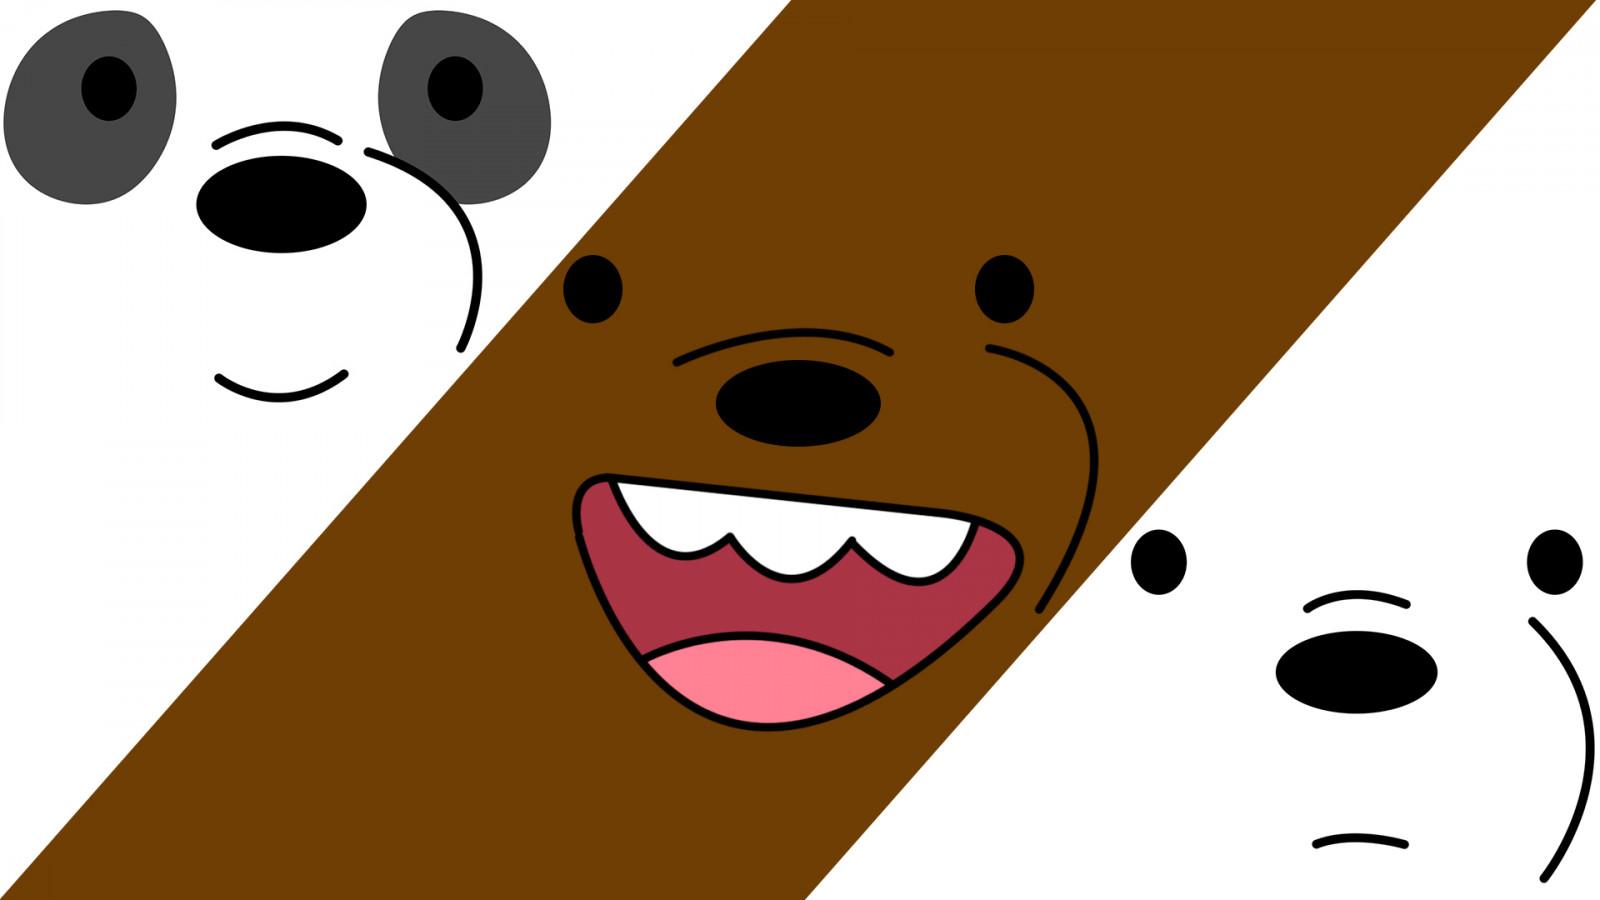 Wallpaper : 1920x1080 px, cartoon, We Bare Bears 1920x1080 - goodfon - 1435911 - HD Wallpapers ...